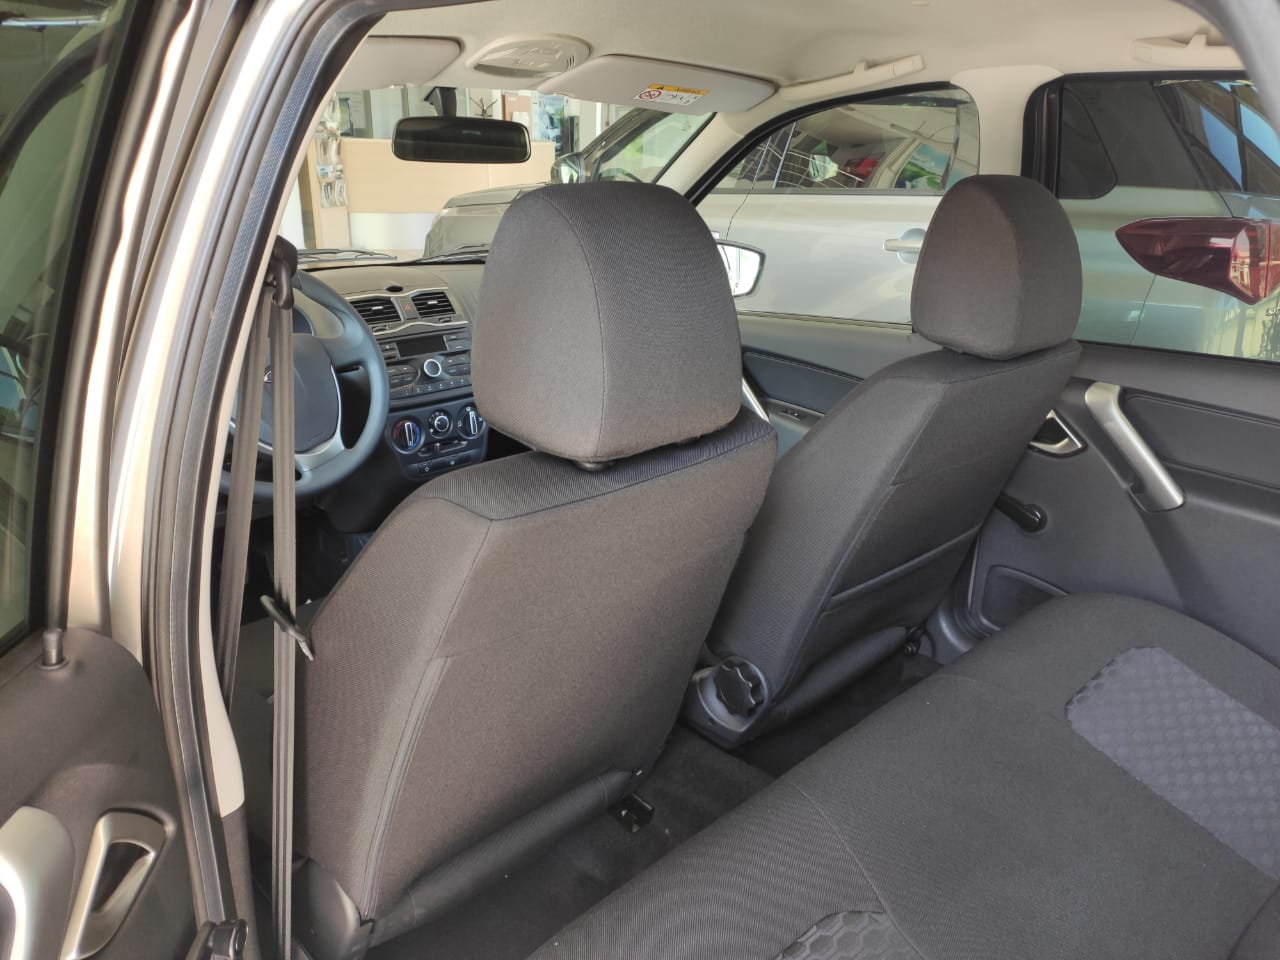 Lada Granta (Лада Гранта) седан 1.6 л 8-кл. (90 л.с.), 5МТ. Comfort, Серебристо-серый. 2021